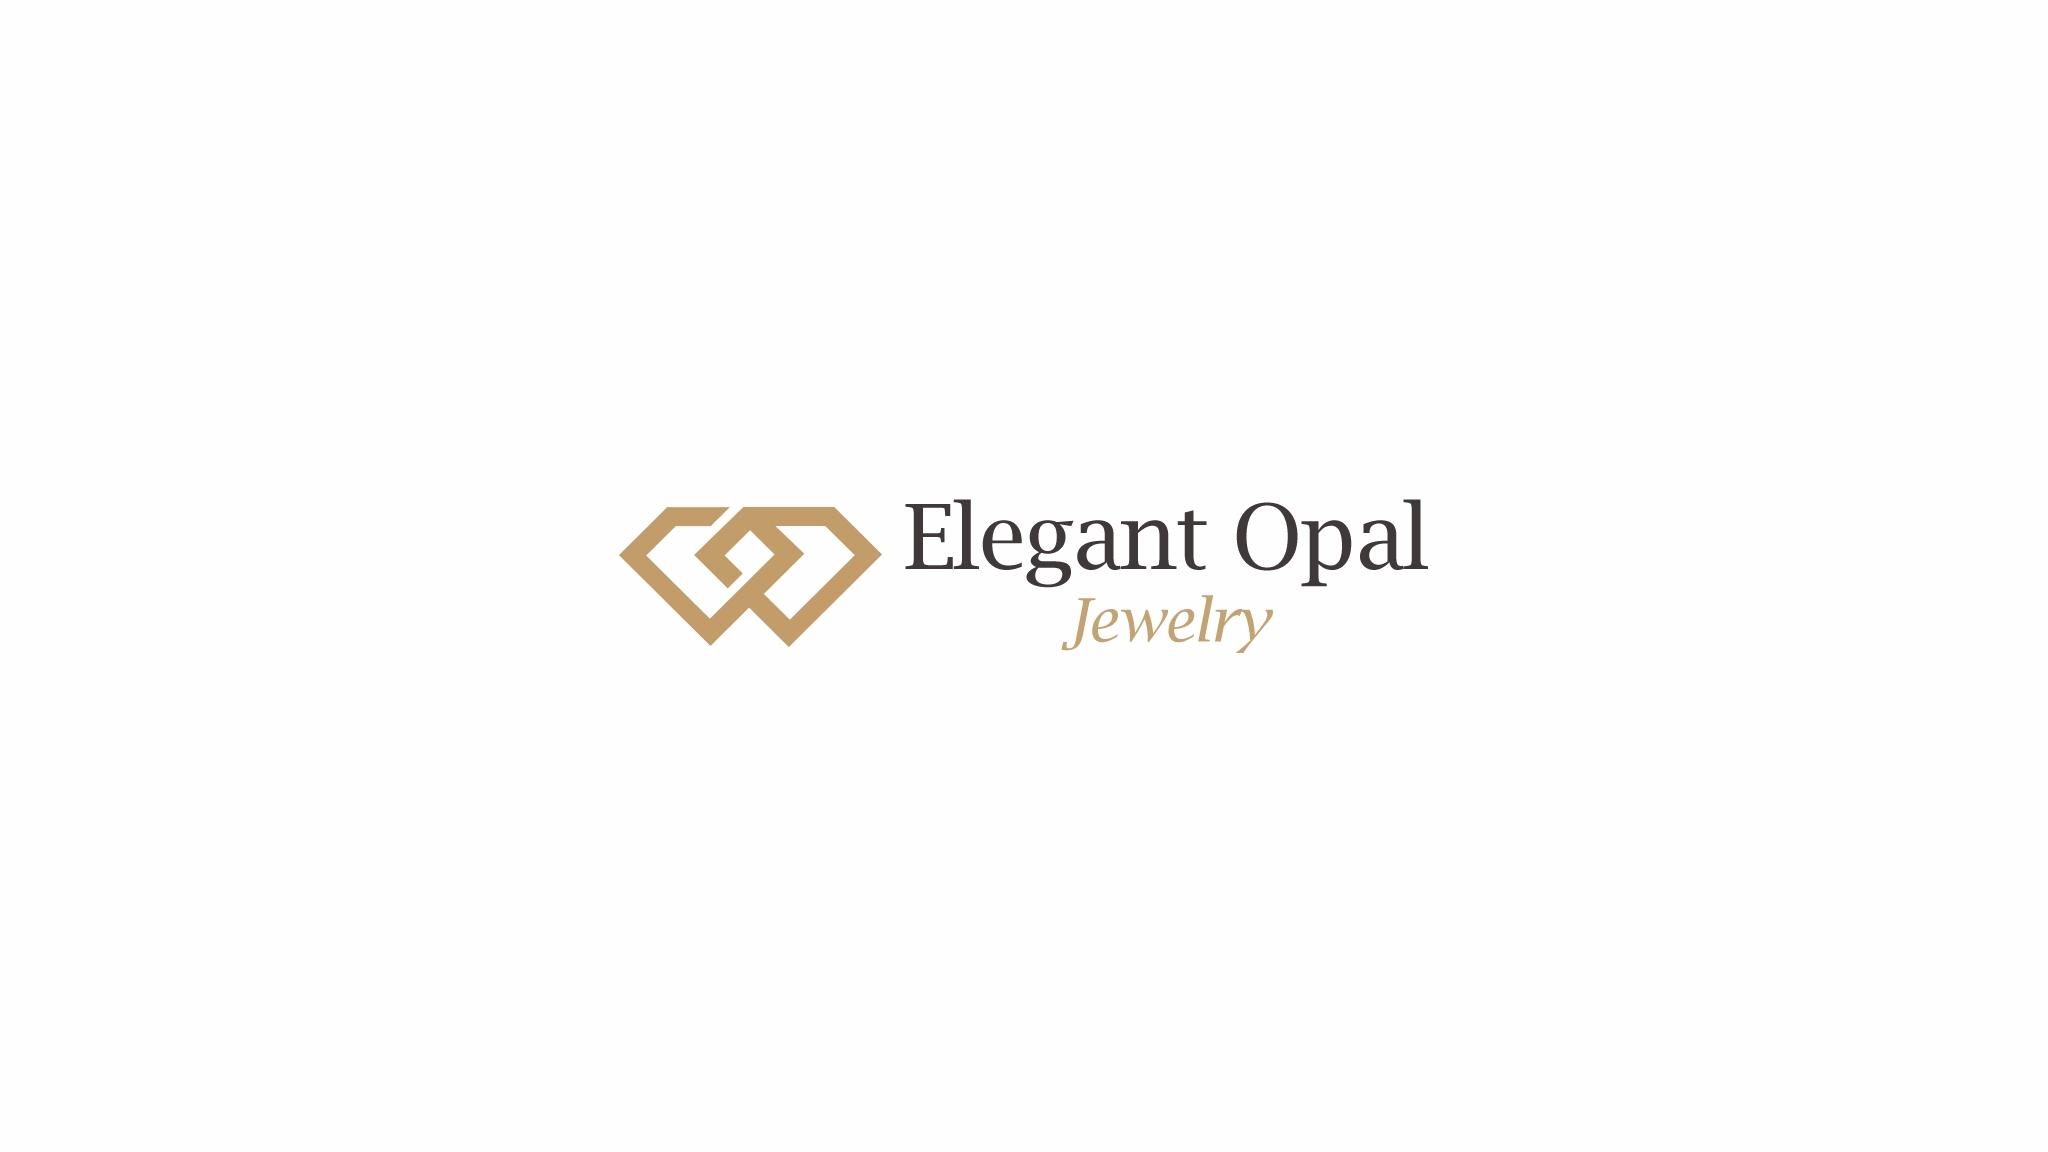 elegantopaljewelry (@elegantopaljewelry) Cover Image